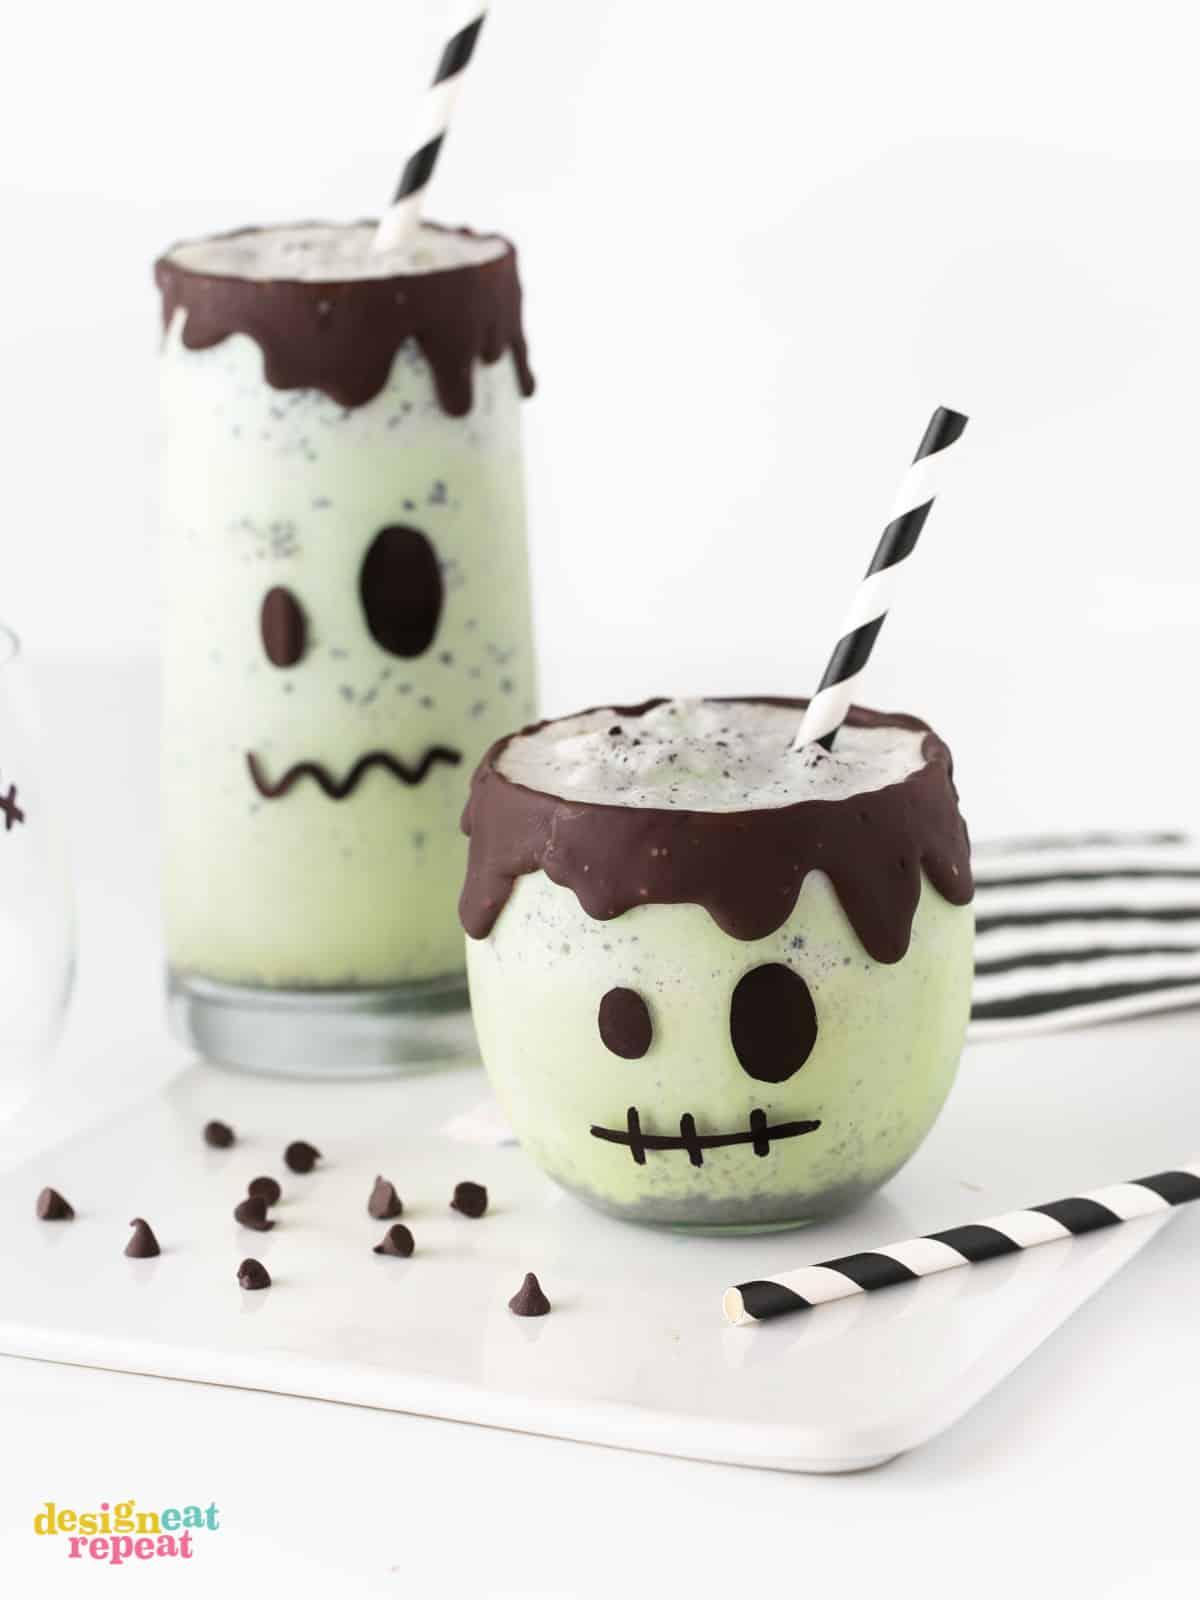 Small mint milkshake decorated like Frankenstein with chocolate rim. With paper black straw and tall Frankenstein green milkshake on white cutting board. Easy Halloween Milkshakes.